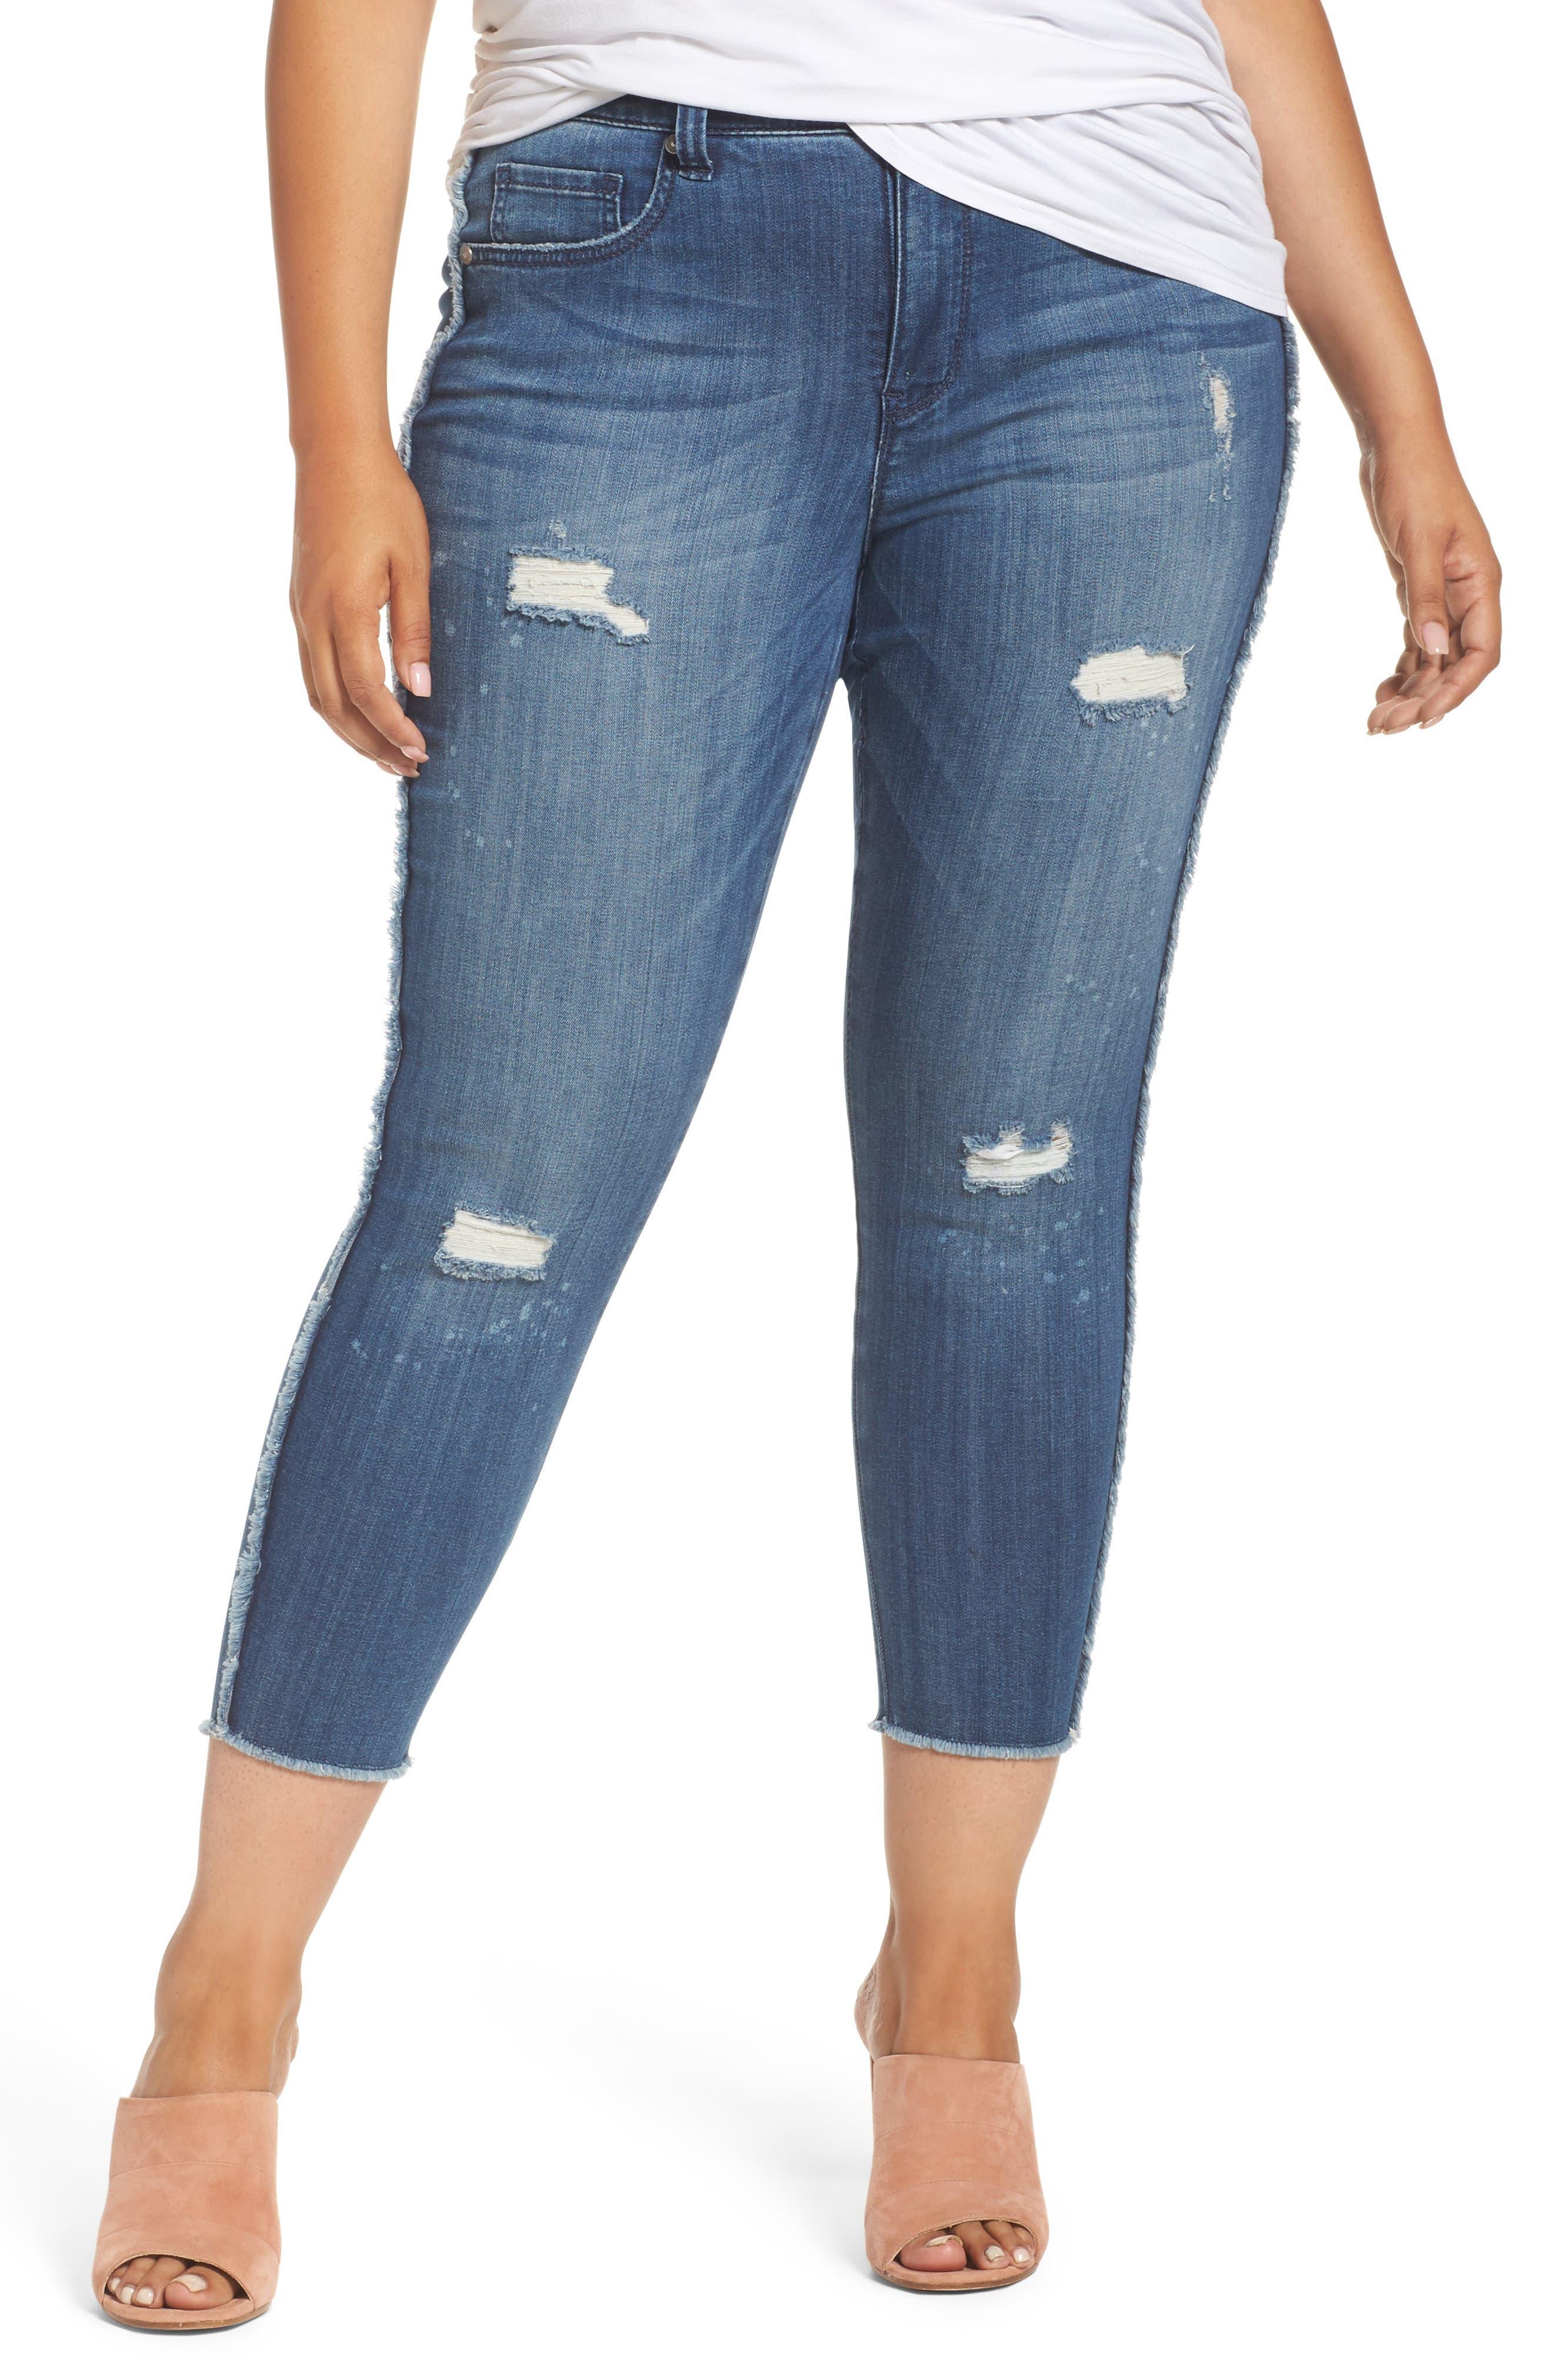 Melissa McCarthy Seven7 Frayed Ankle Pencil Jeans (Destiny) (Plus Size)